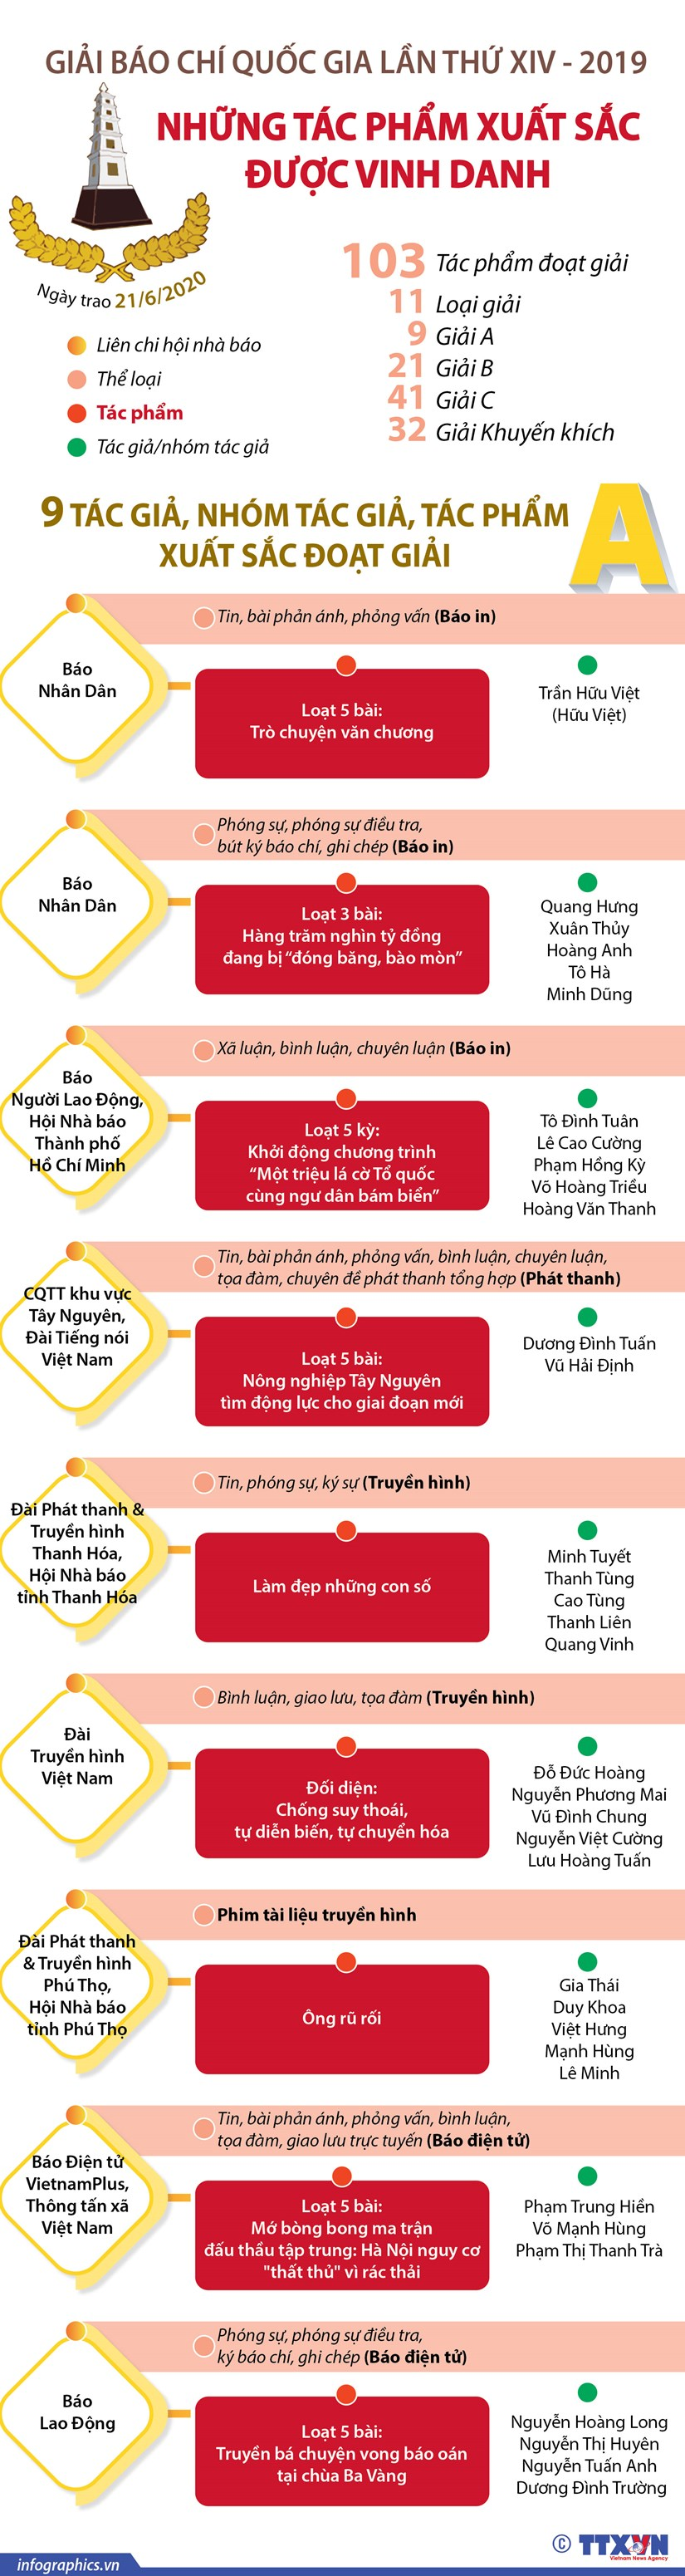 [Infographics] Nhung tac pham doat giai A Giai Bao chi quoc gia hinh anh 1